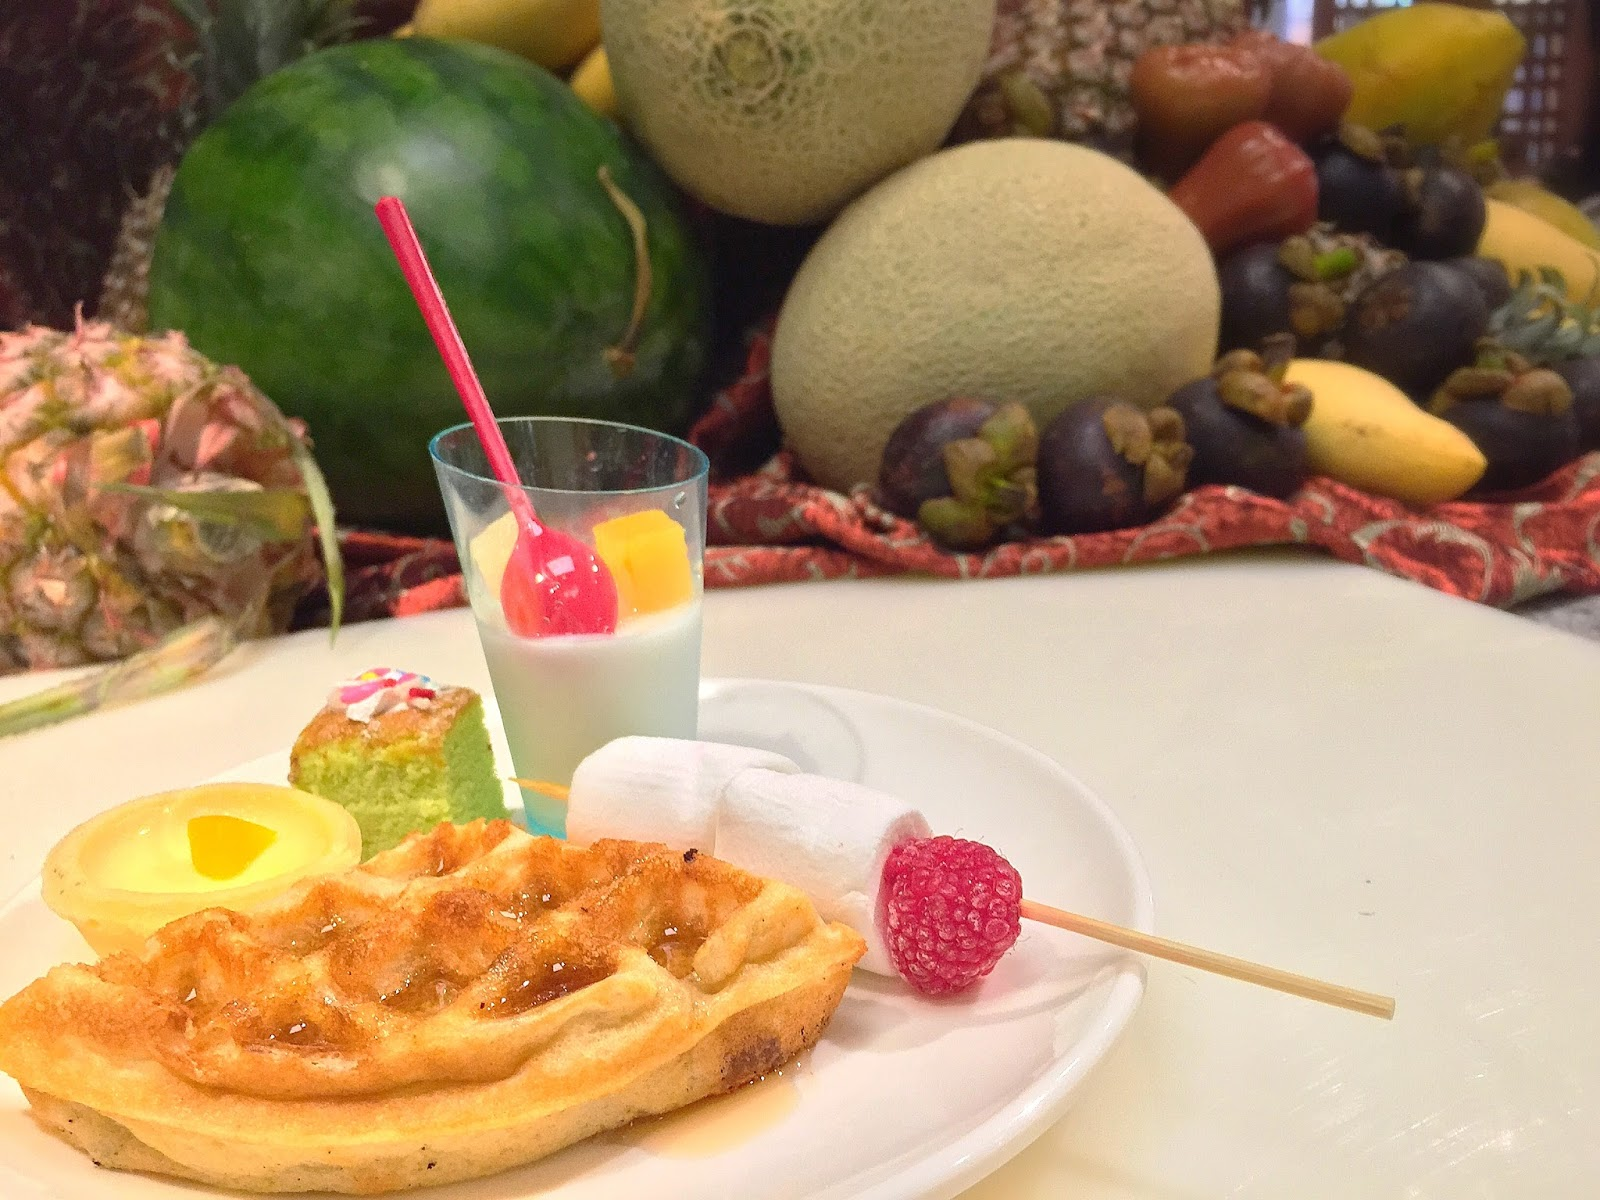 1 Market (Plaza Singapura) - Waffles